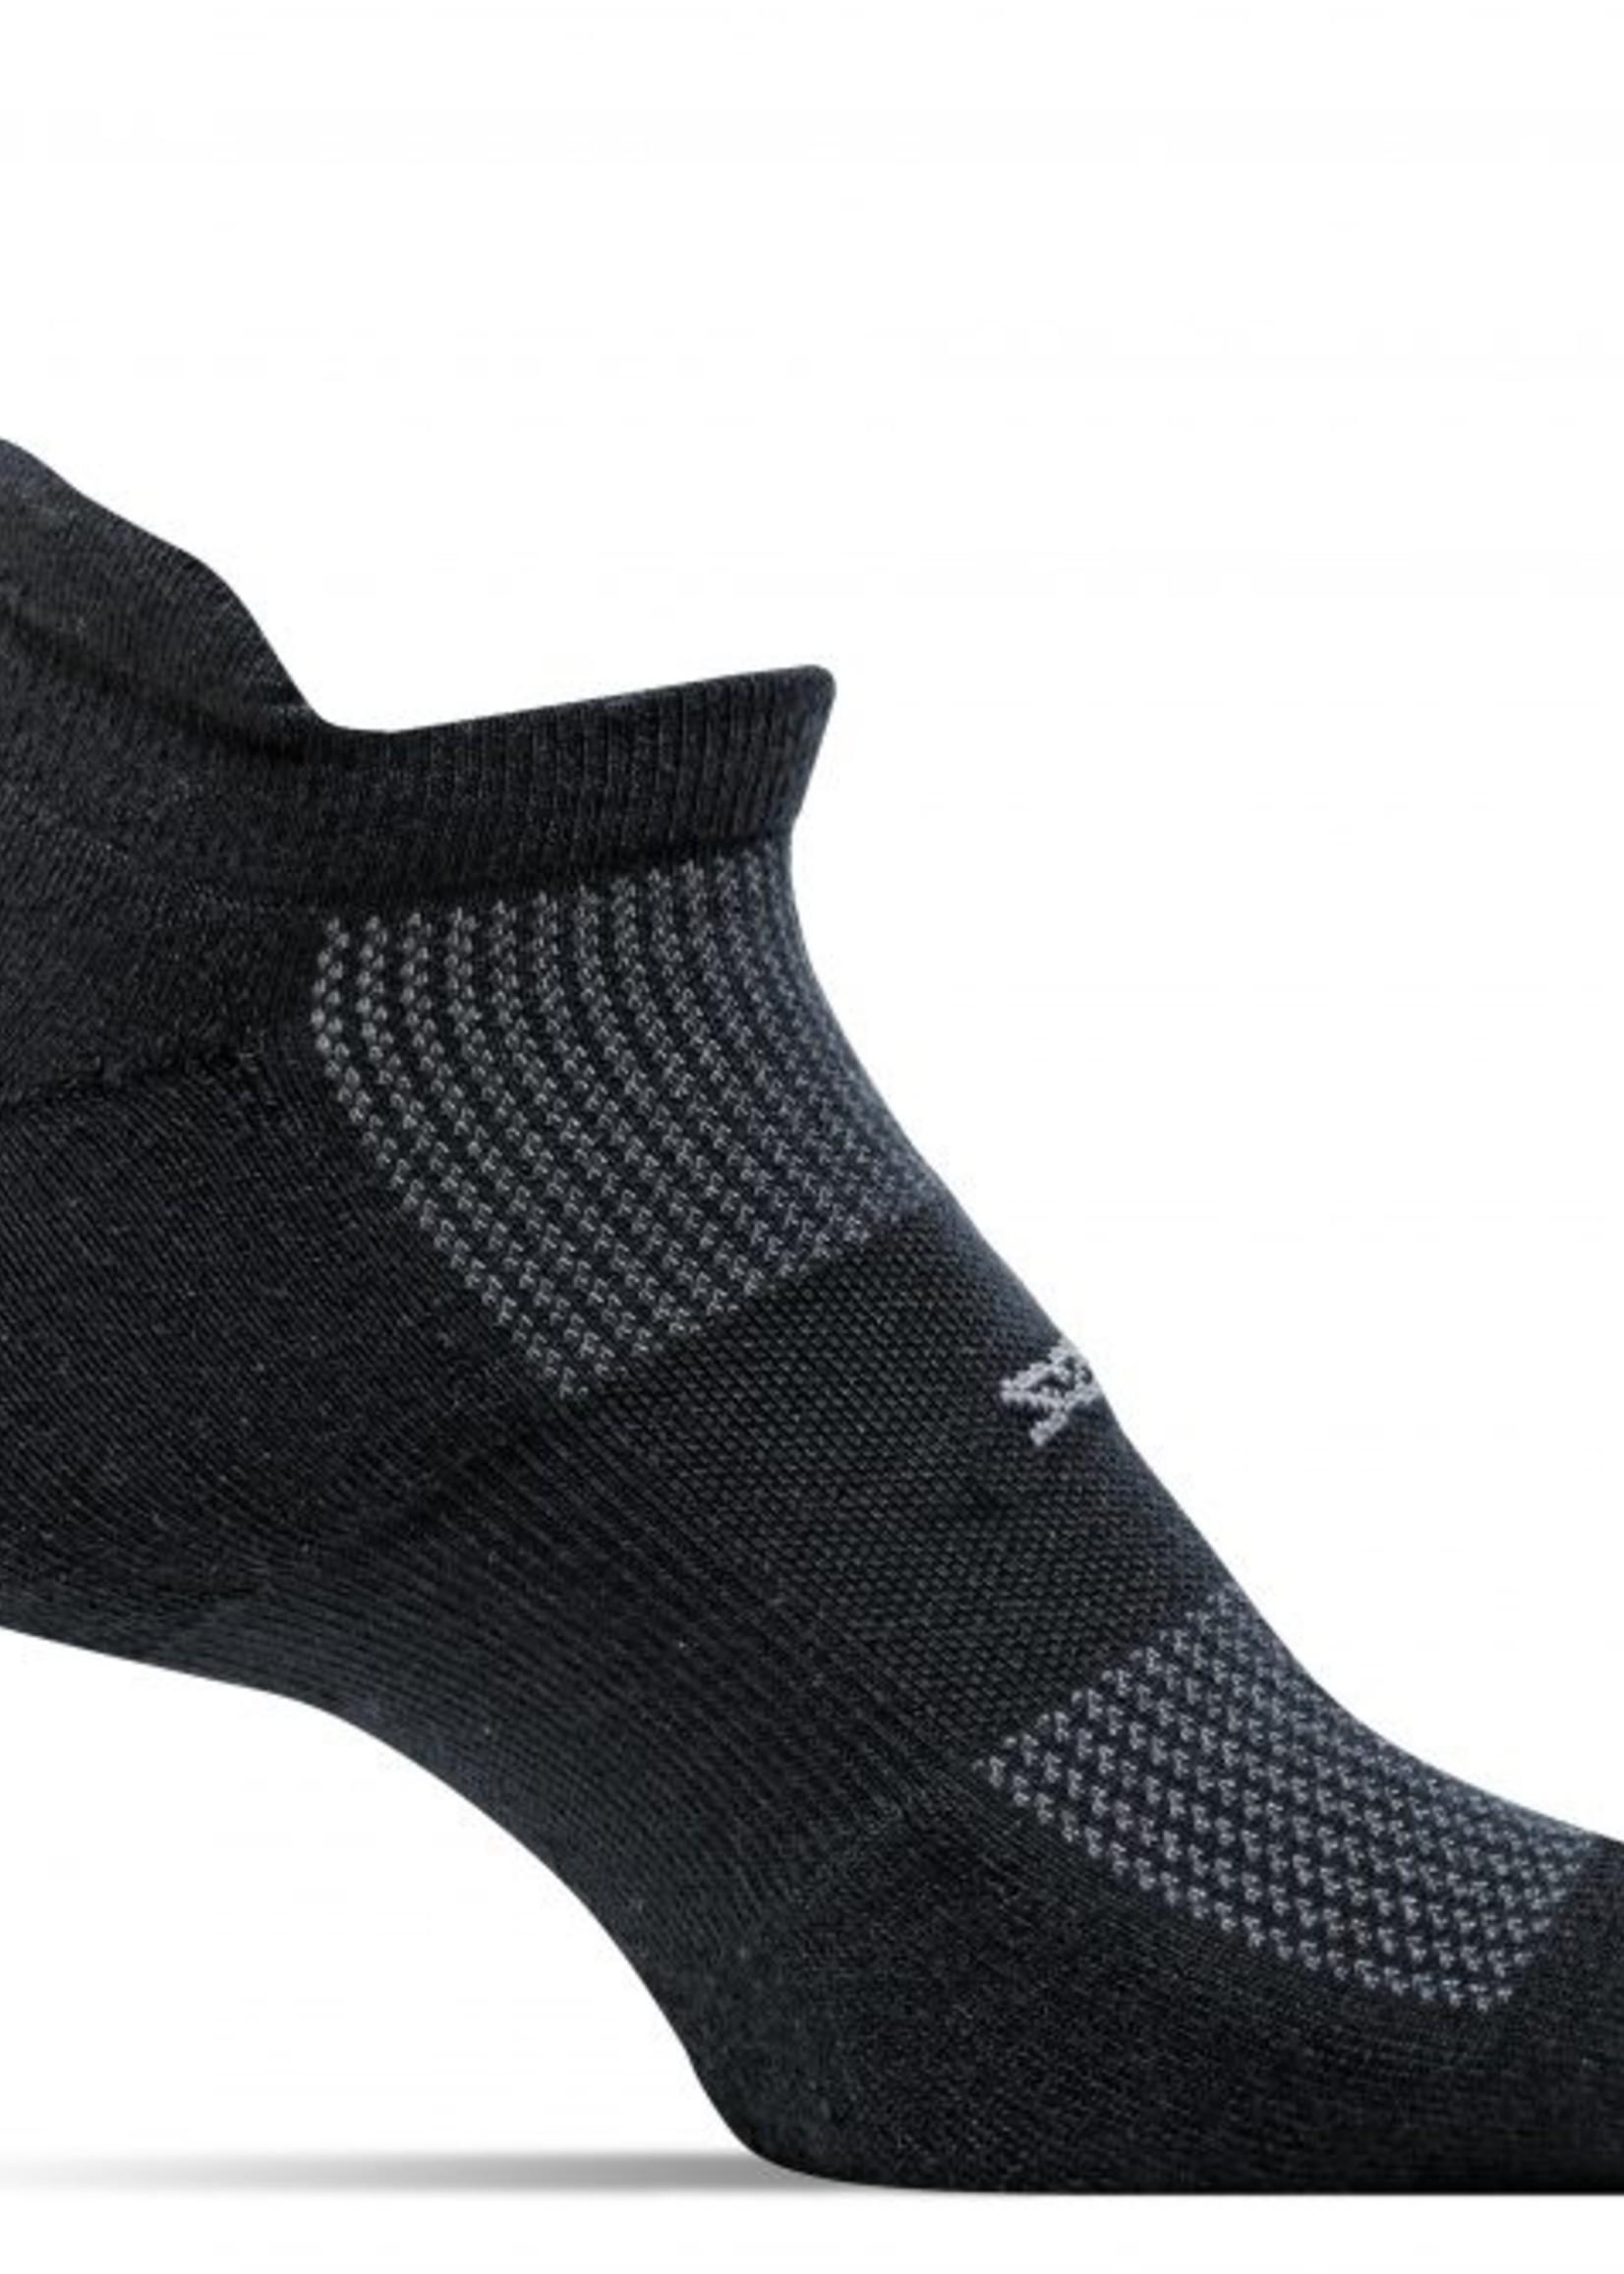 Feetures Feetures High Performance Cushion No Show Socks